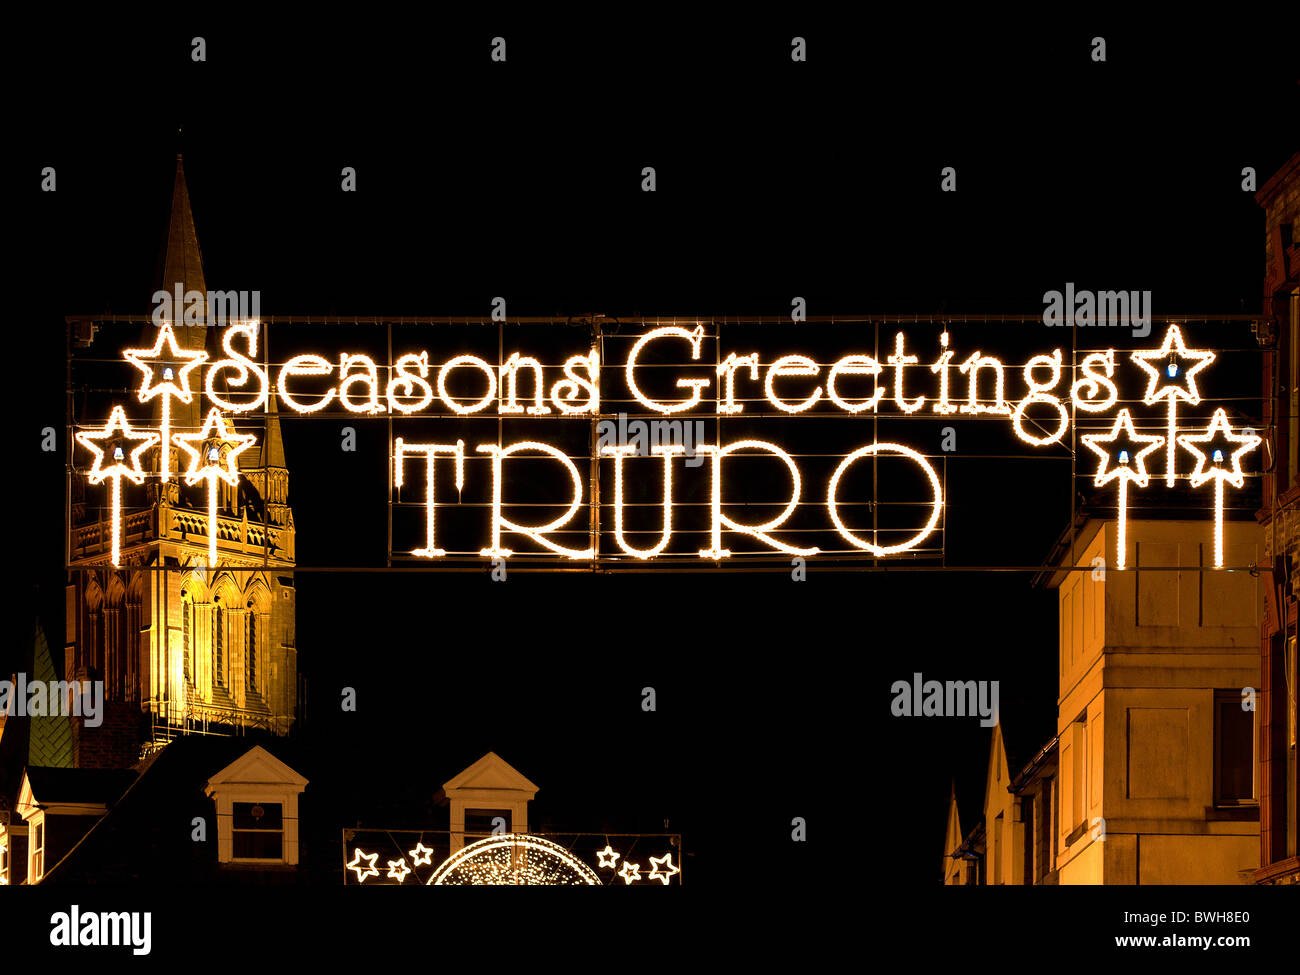 Christmas lights in Truro, Cornwall, Uk Stock Photo: 32956616 - Alamy